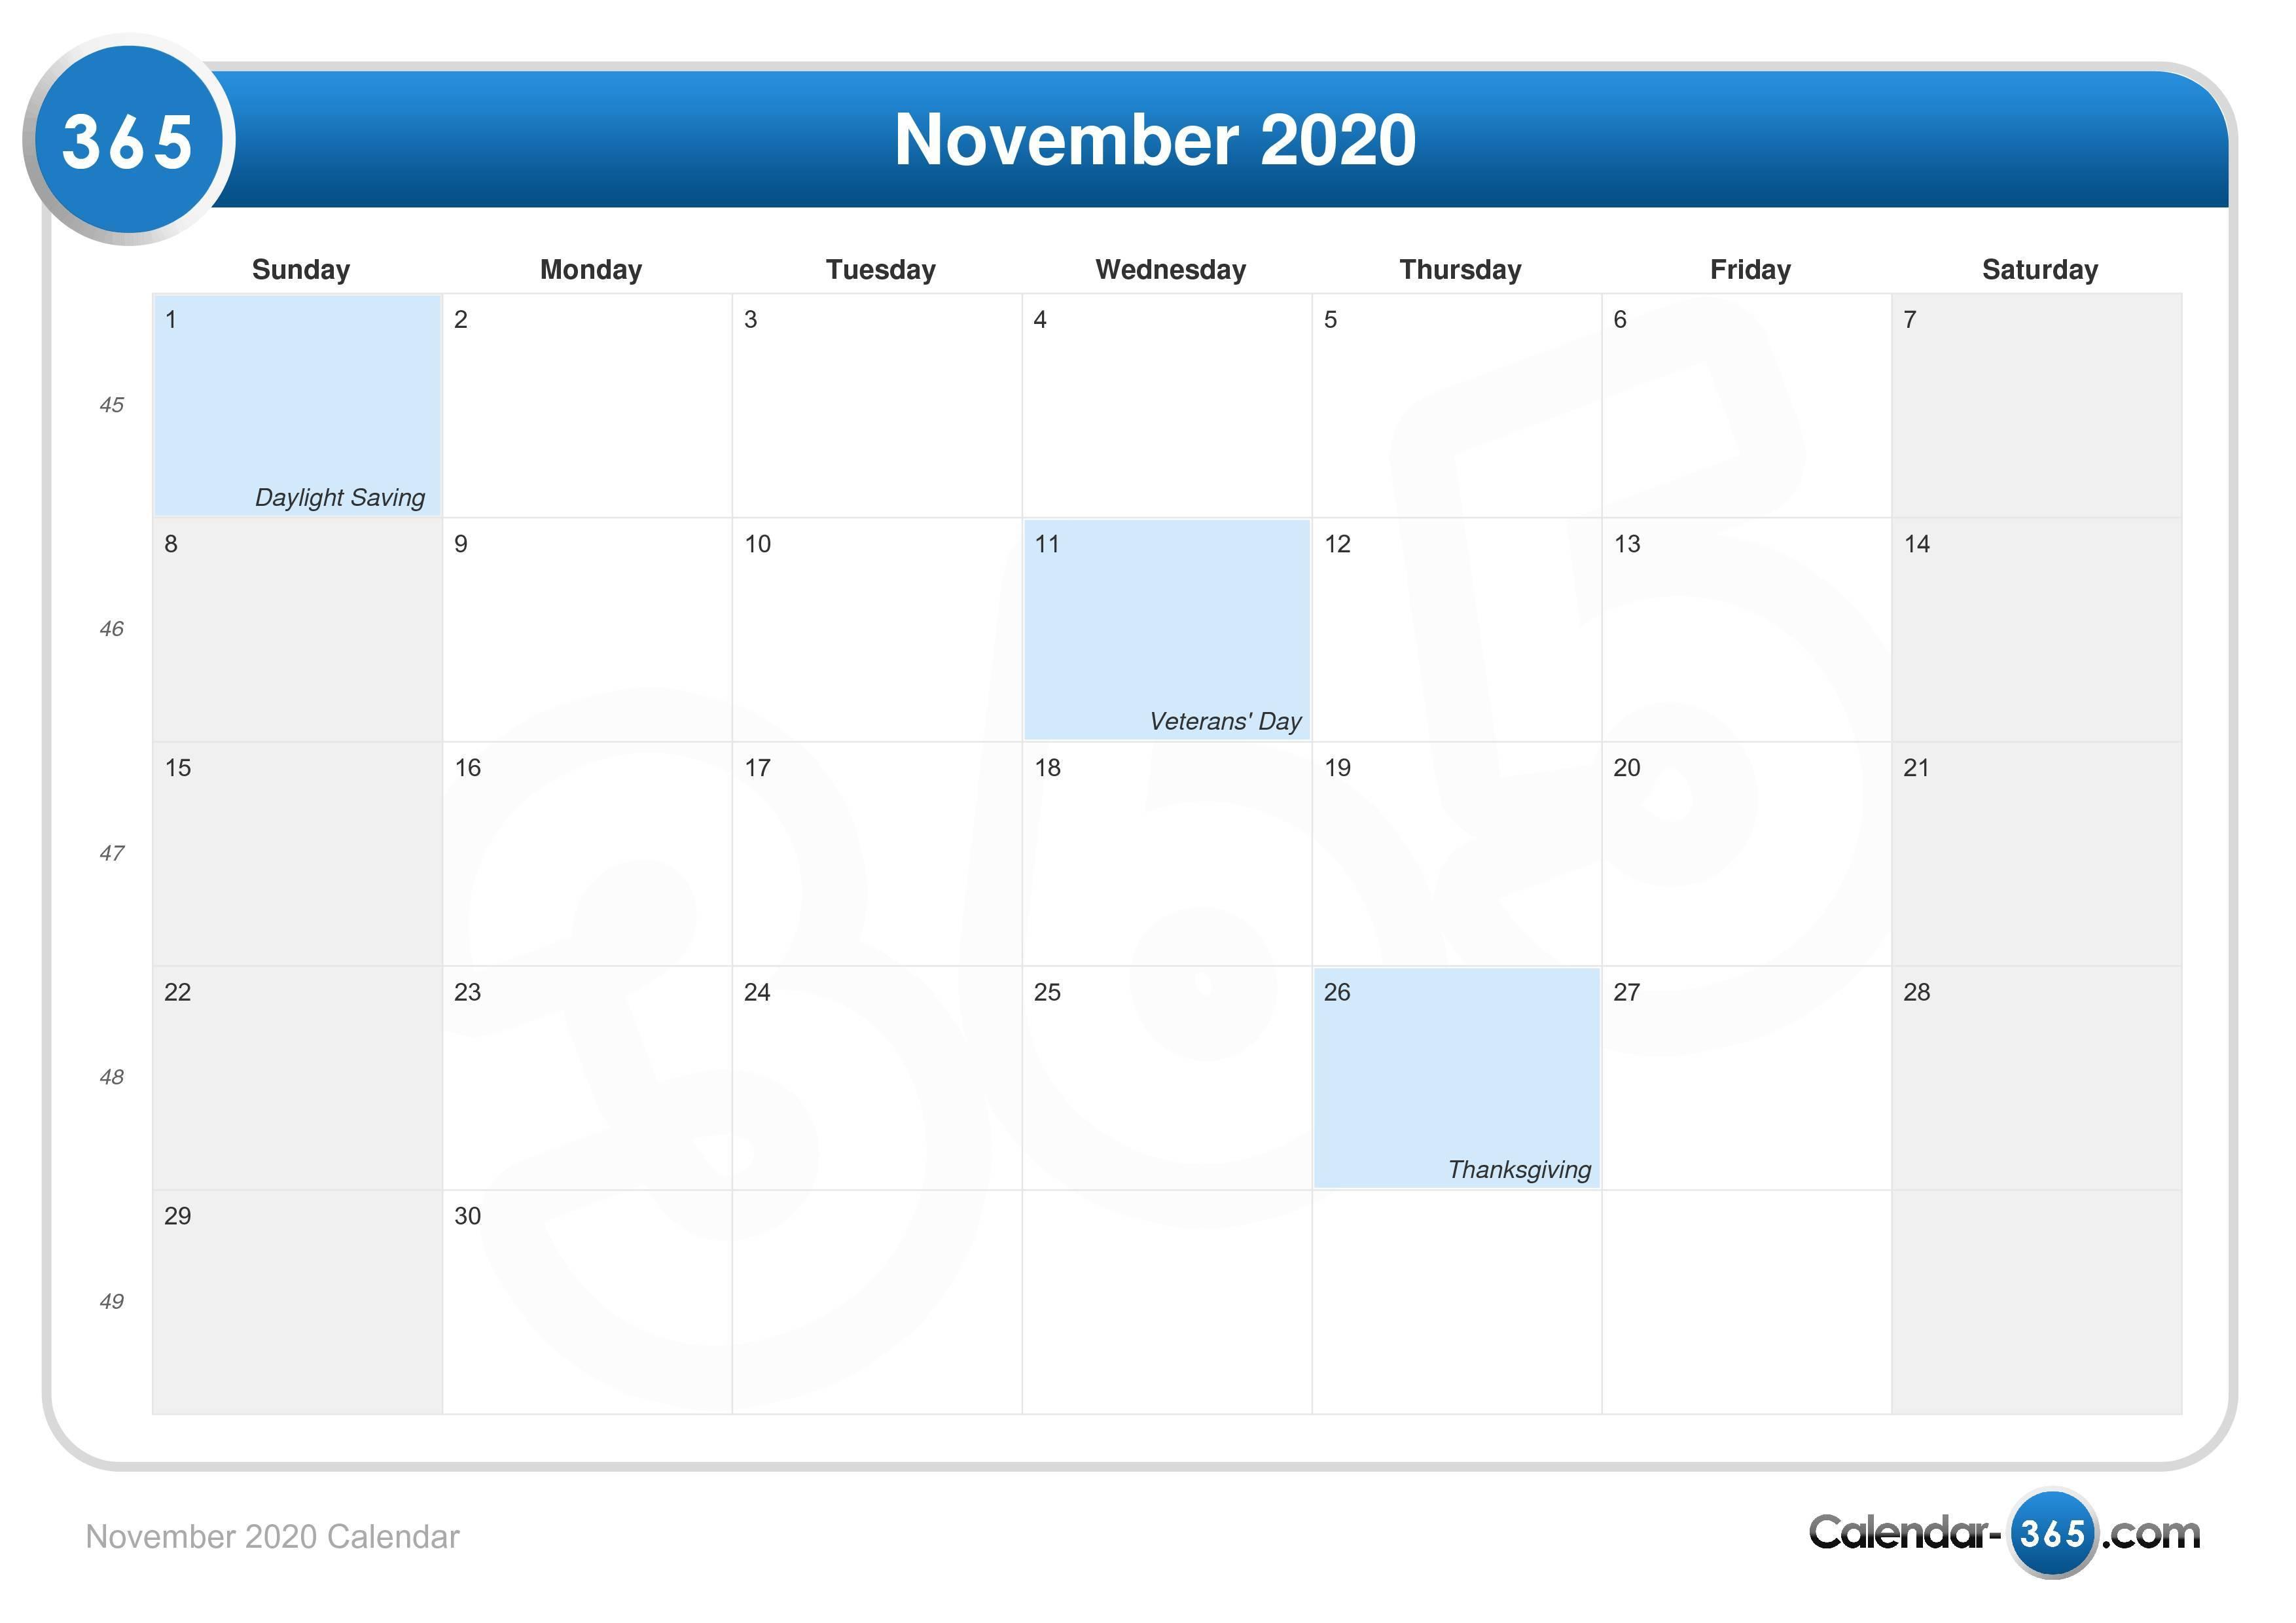 November 2020 Calendar pertaining to Berkeley 2020-2020 Calendar